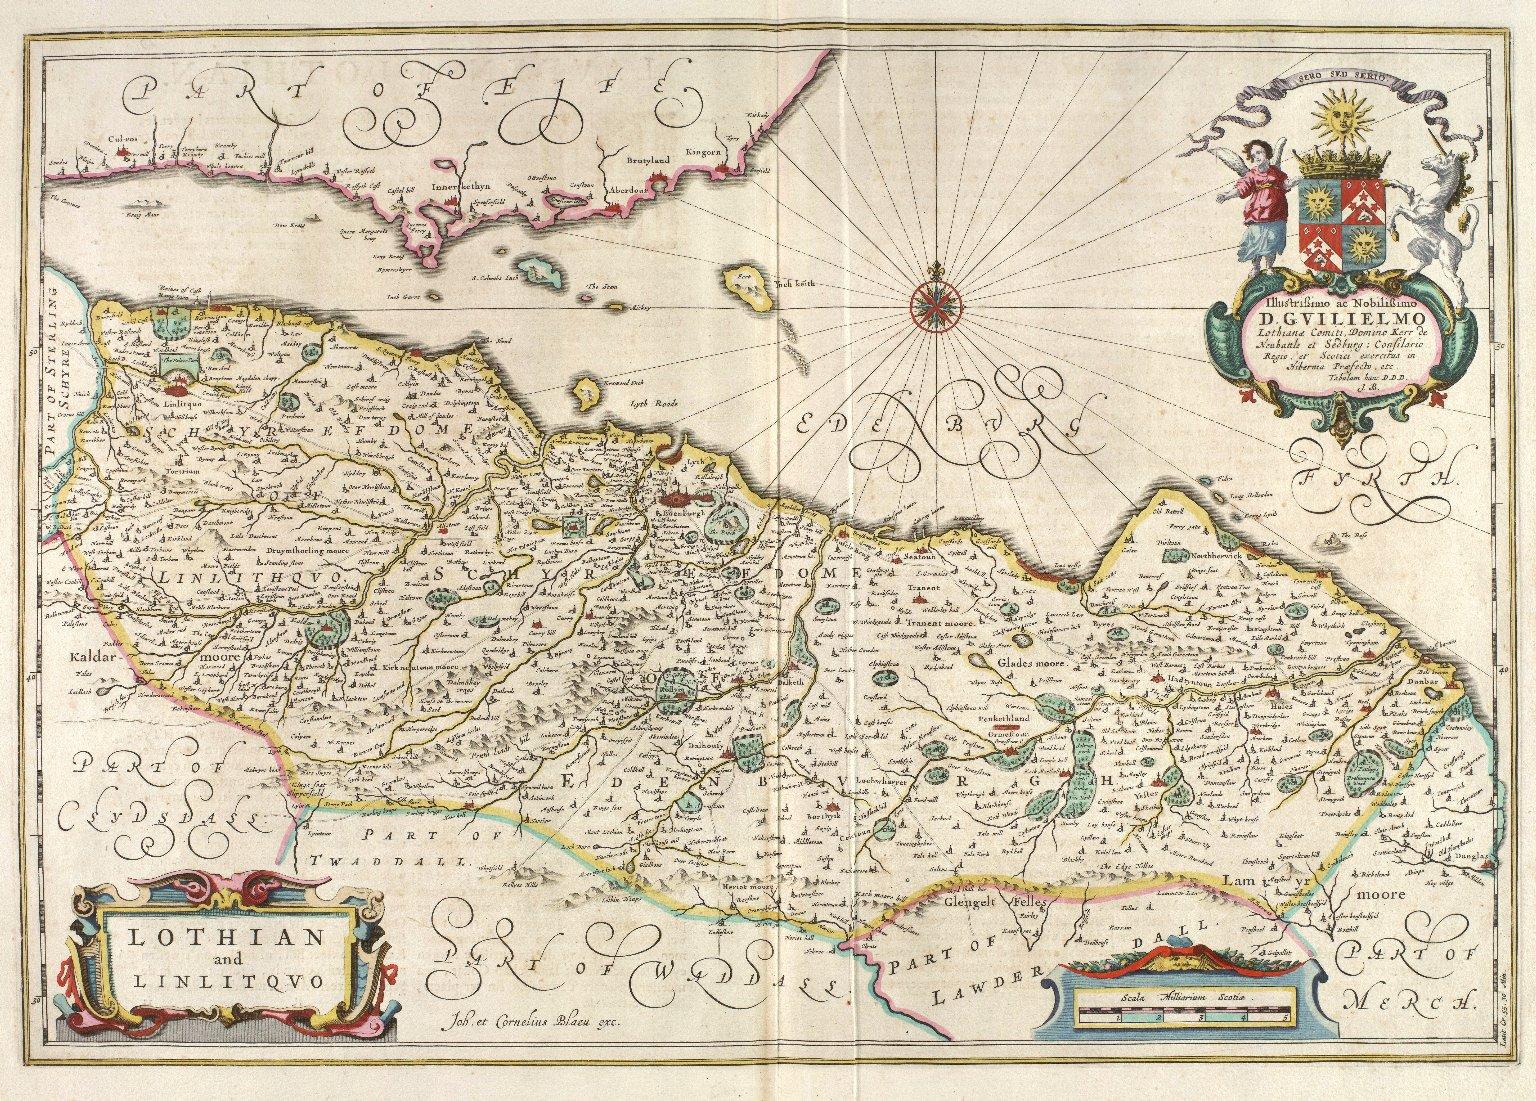 [Geographiae Blavianae] [Also known as: Atlas major] [040 of 153]